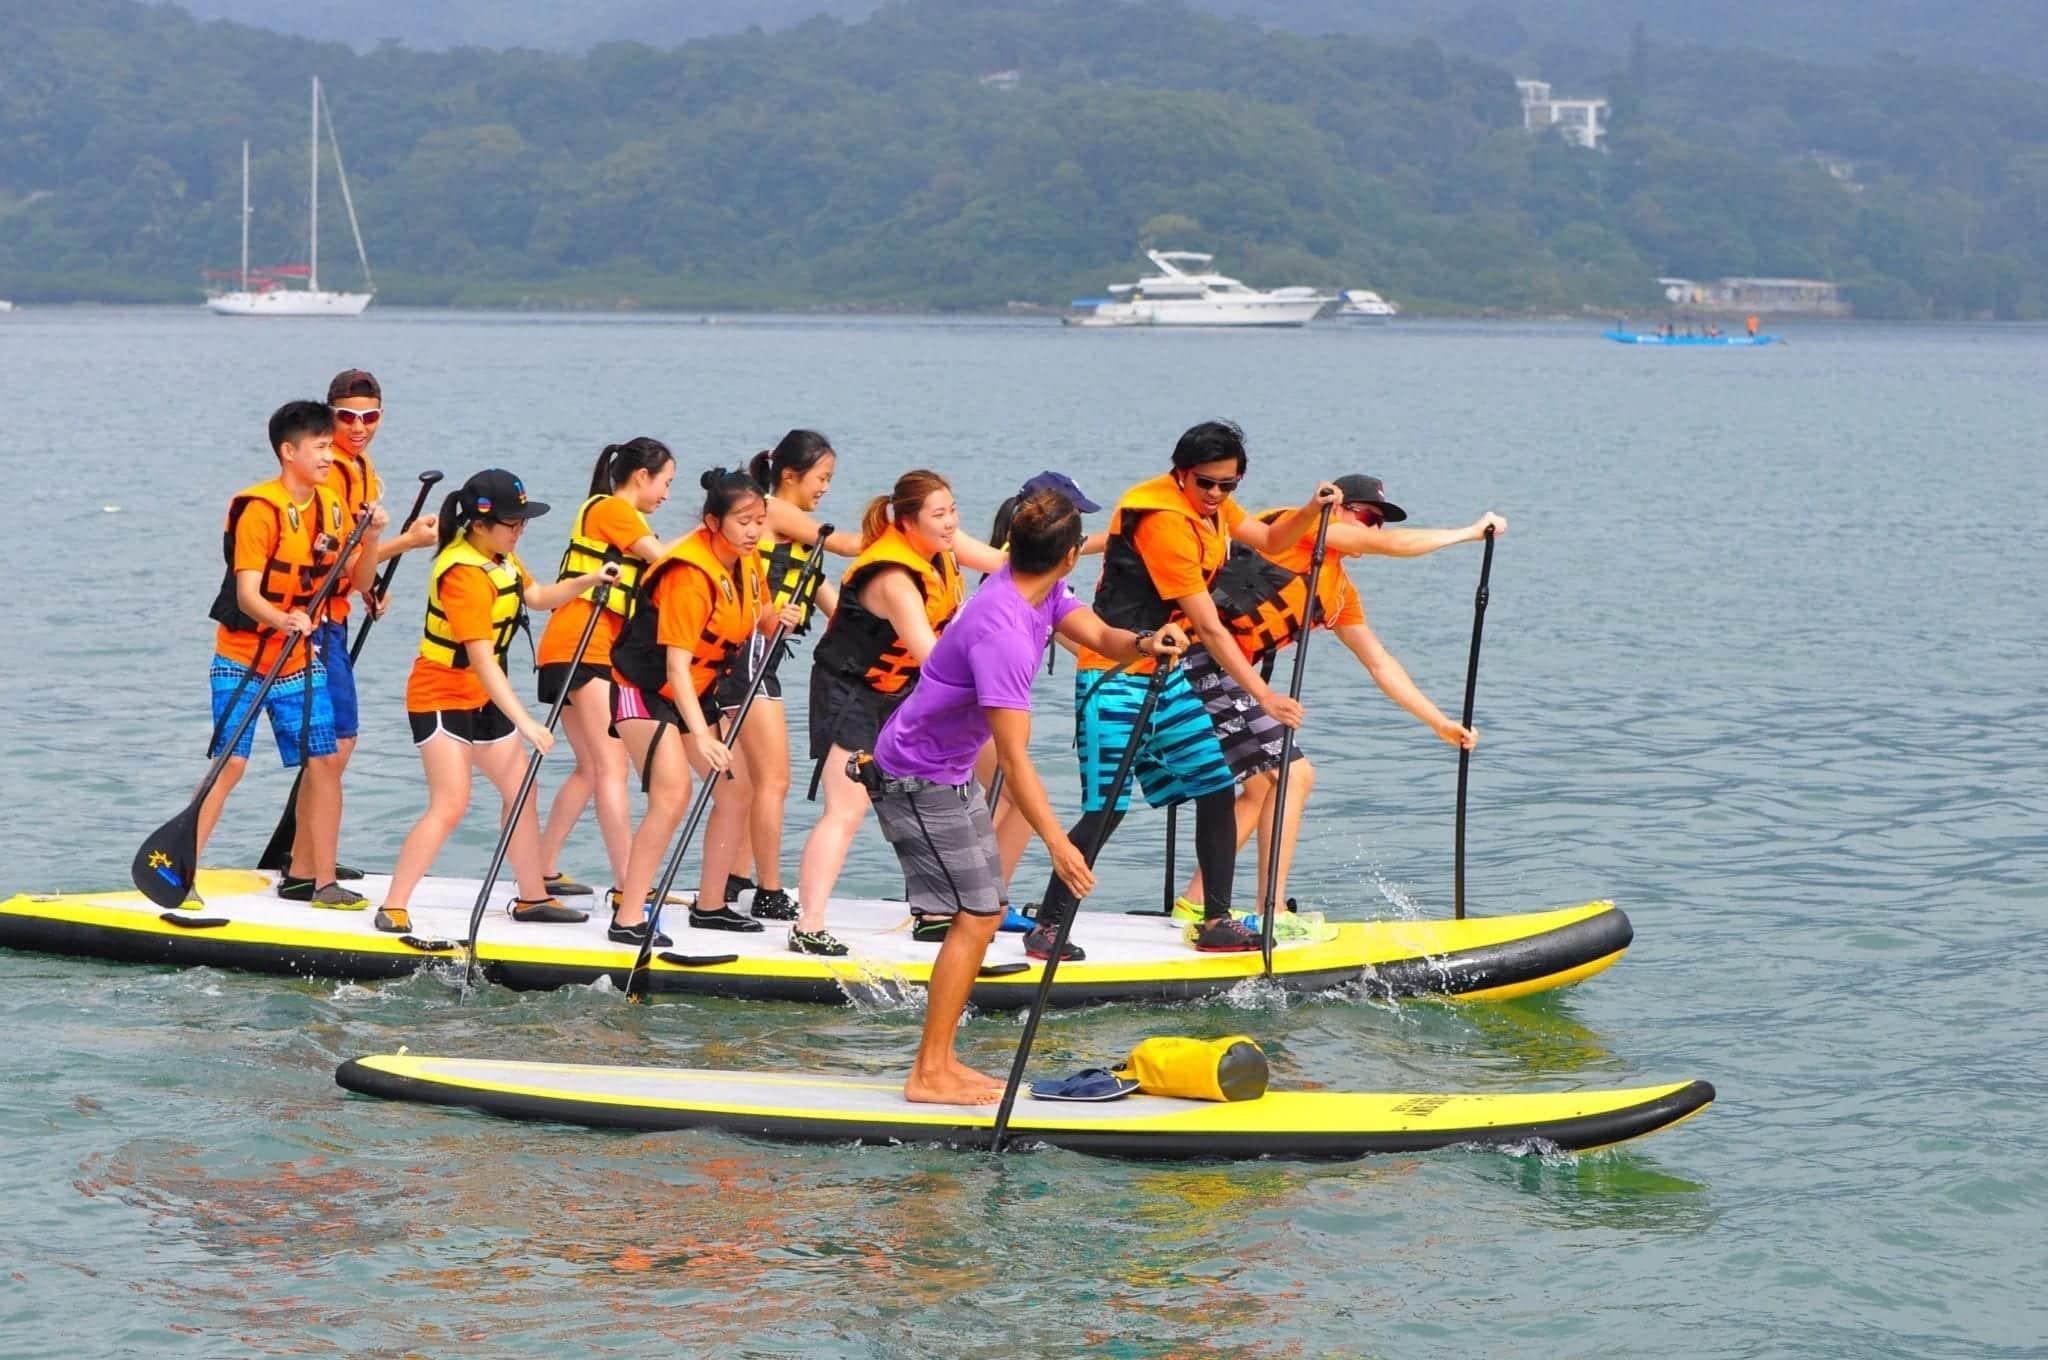 RCHK Wet & Wild 5 Days Mixed Water Sports Camp